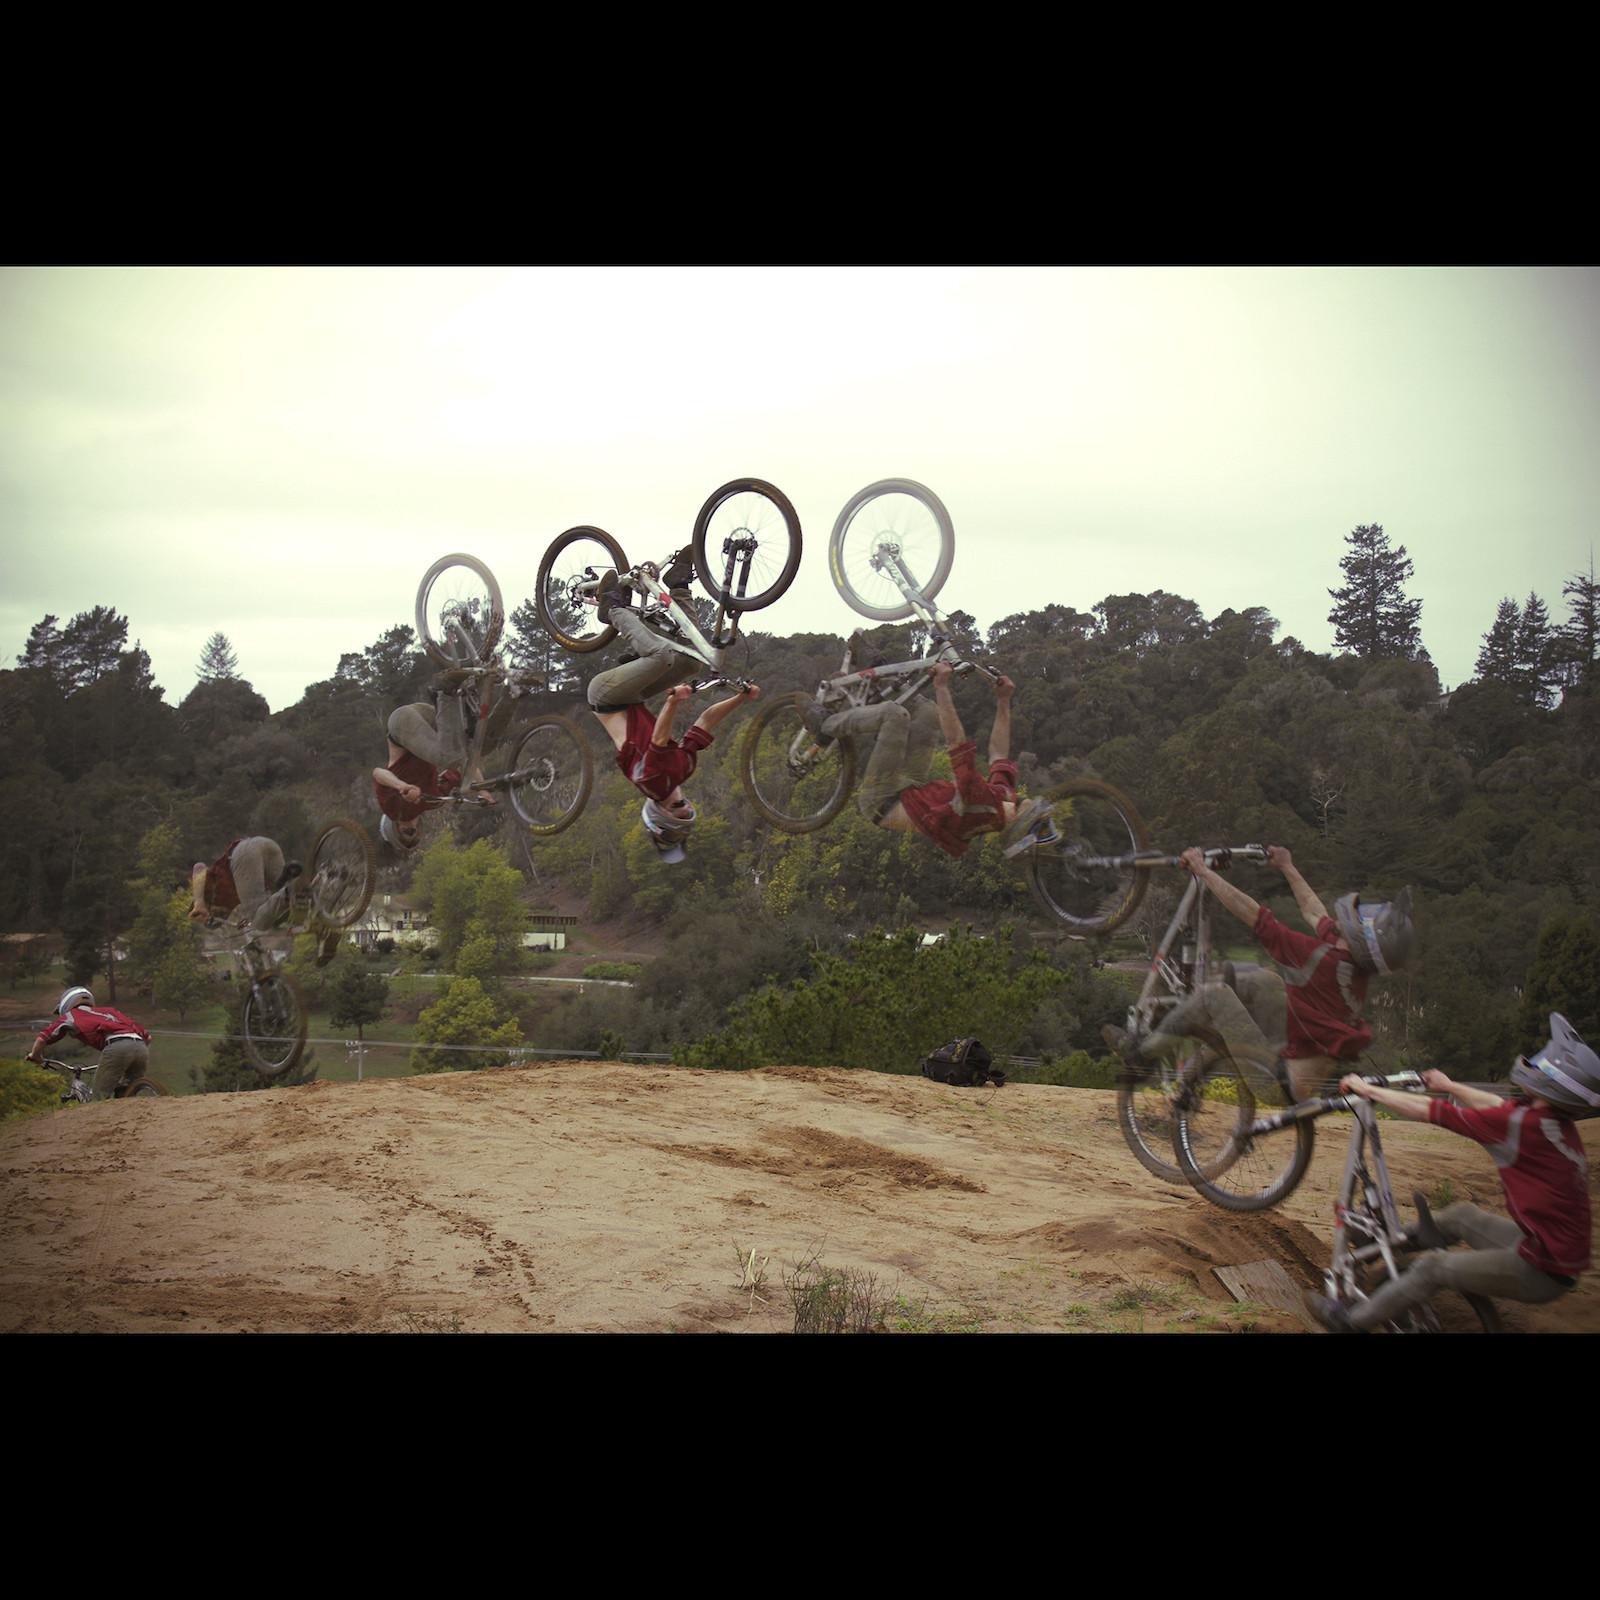 Flip Sequence - Simon_Silver - Mountain Biking Pictures - Vital MTB